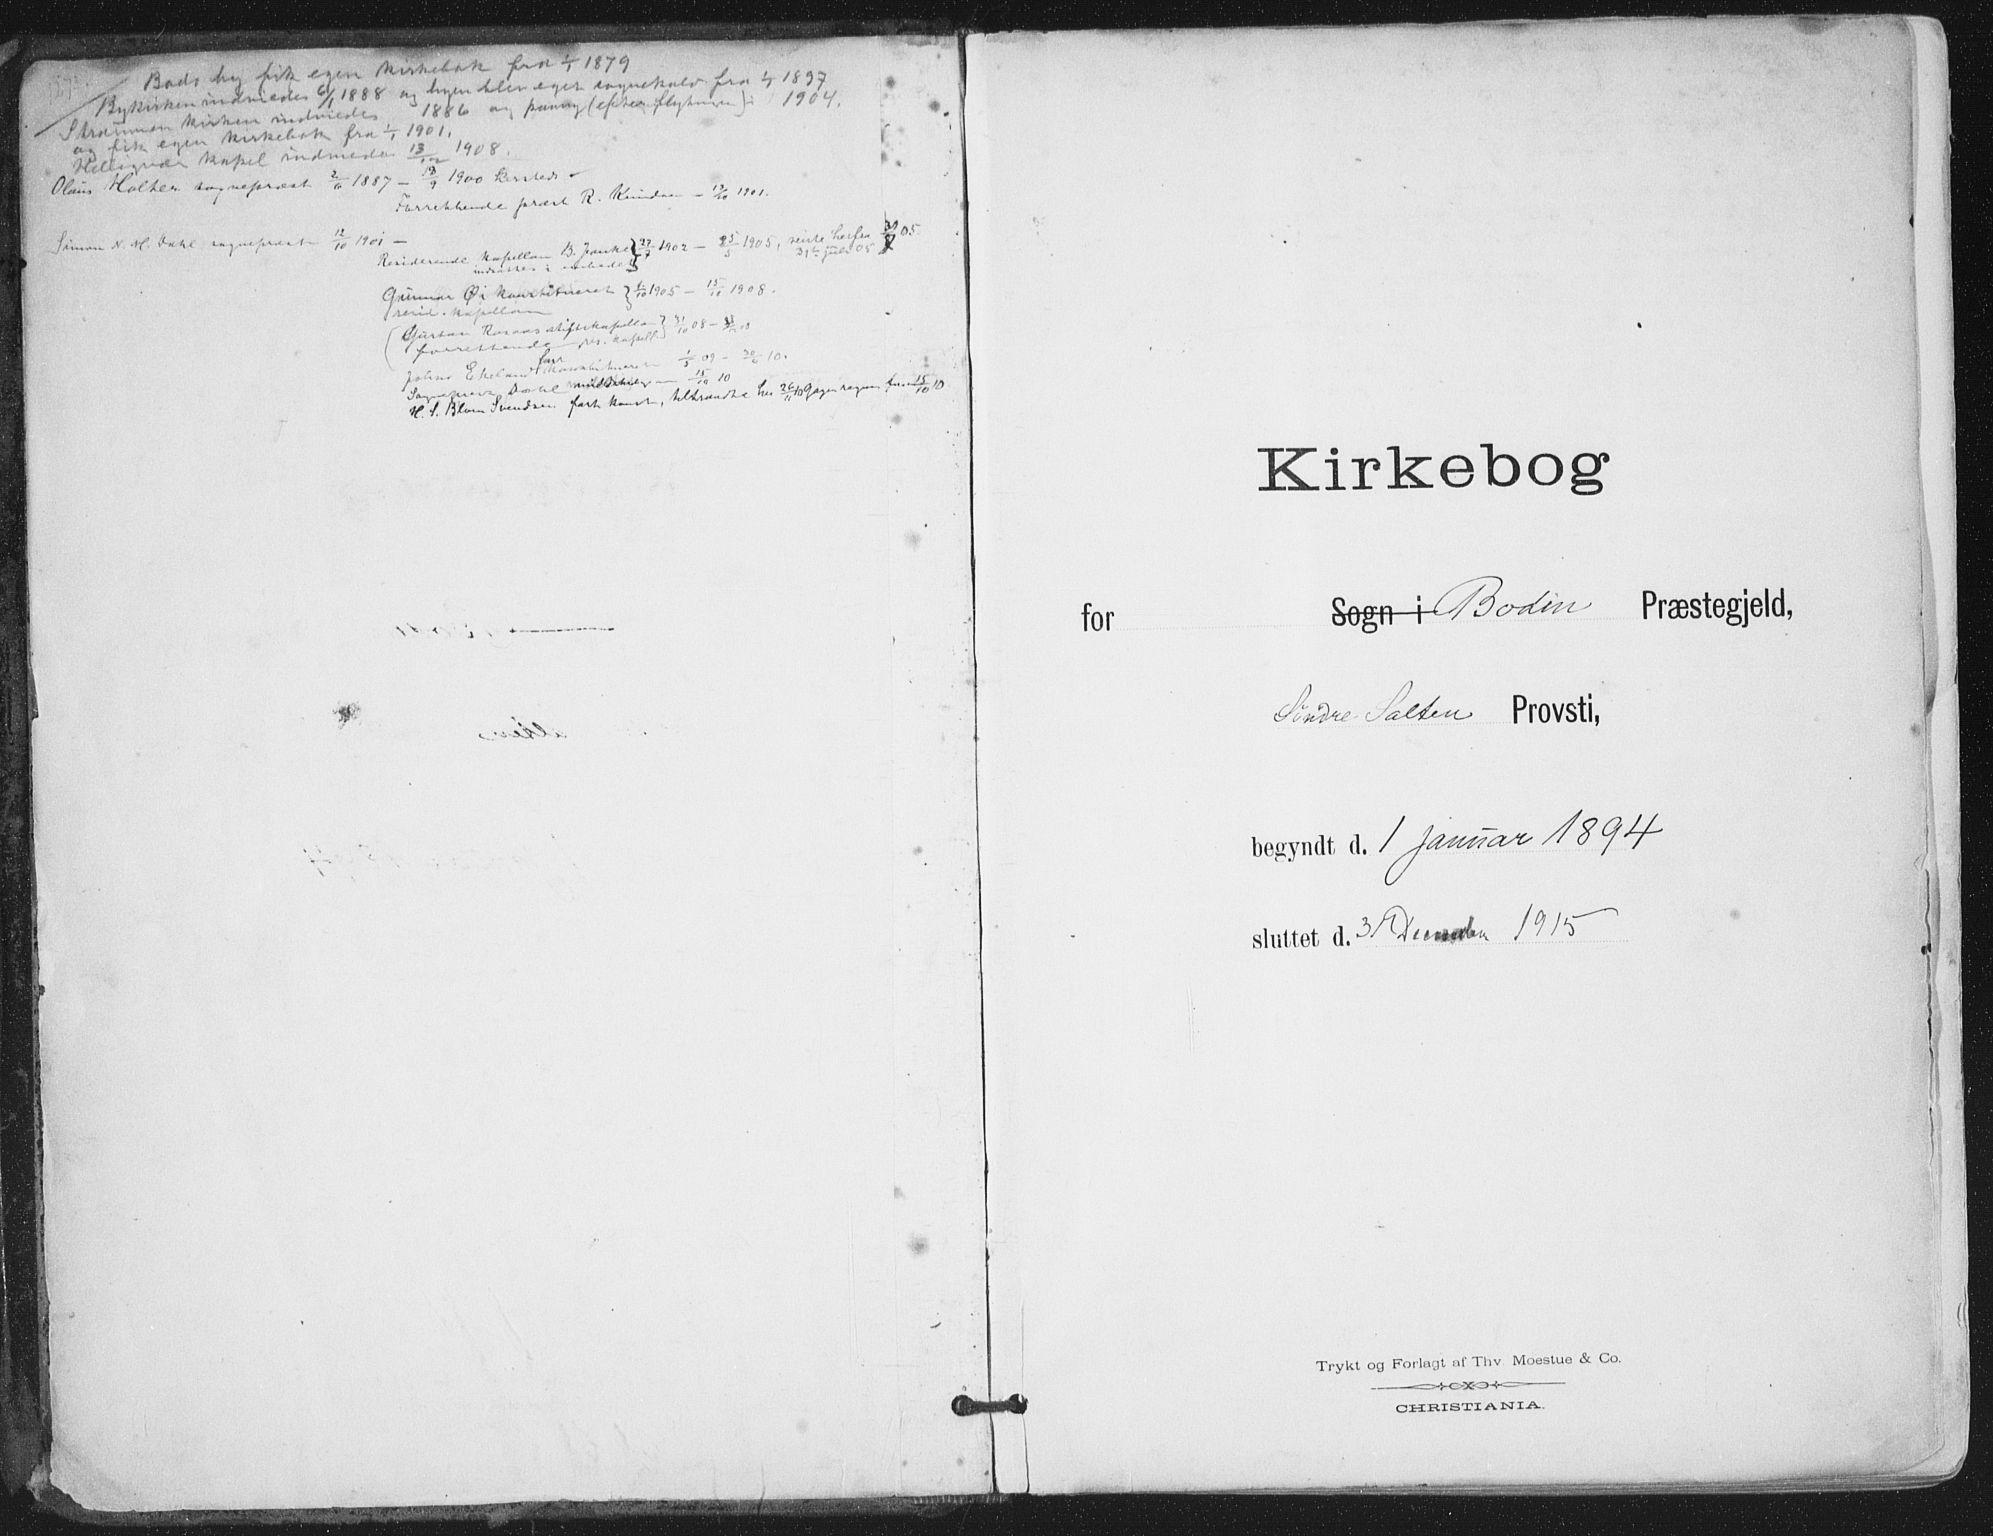 SAT, Ministerialprotokoller, klokkerbøker og fødselsregistre - Nordland, 802/L0055: Ministerialbok nr. 802A02, 1894-1915